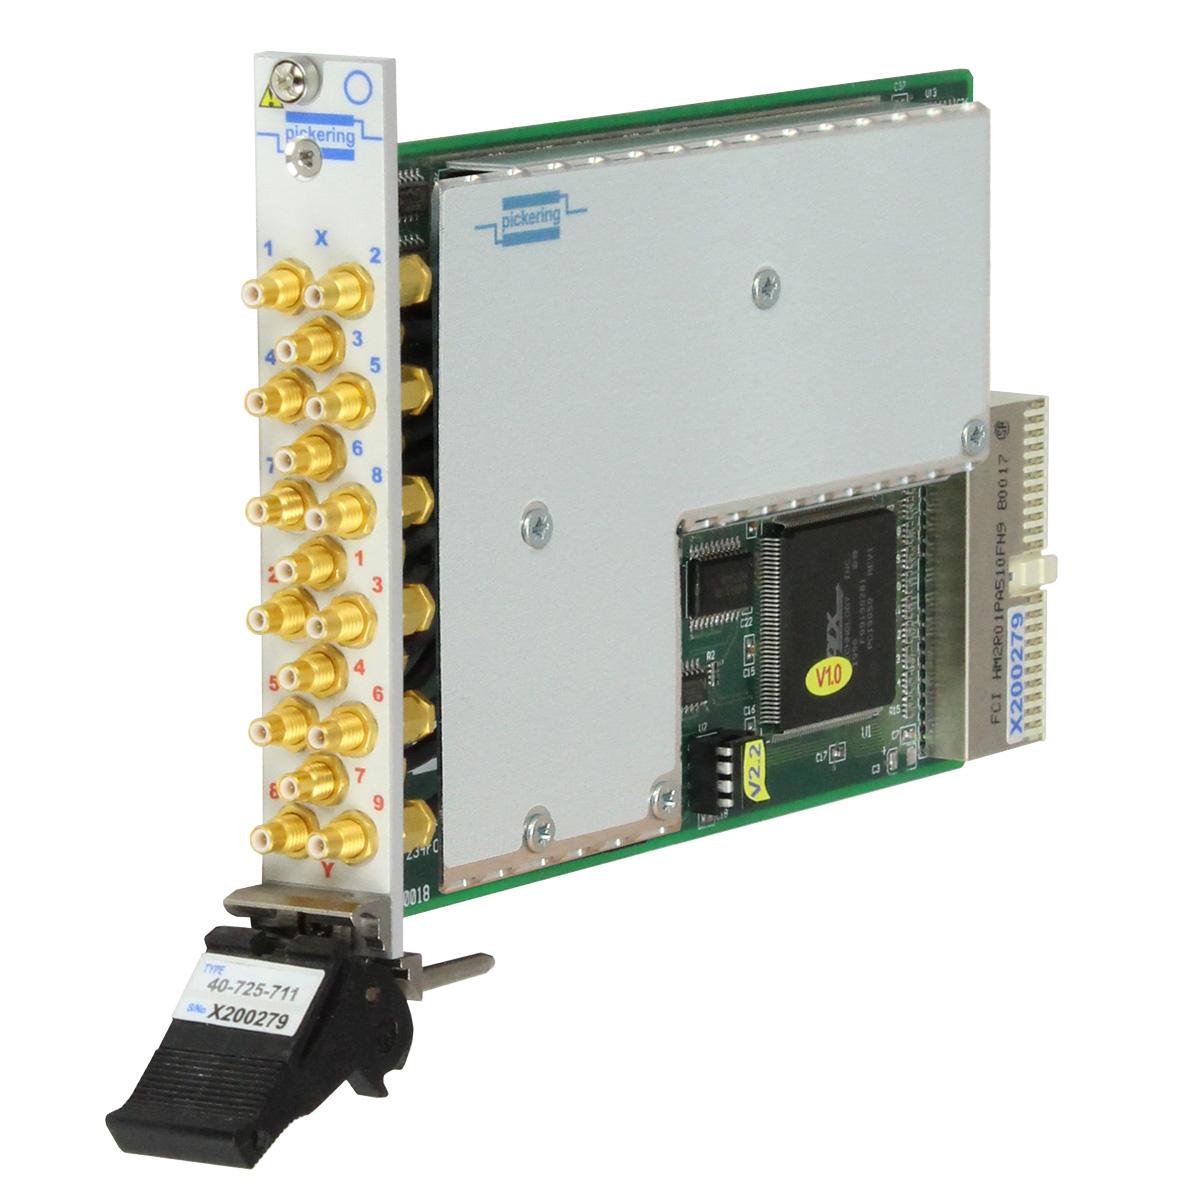 Pxi 8x9 Rf Matrix 500mhz 50ohm Smb 40 725 511 0 Pic16f876 Power Meter